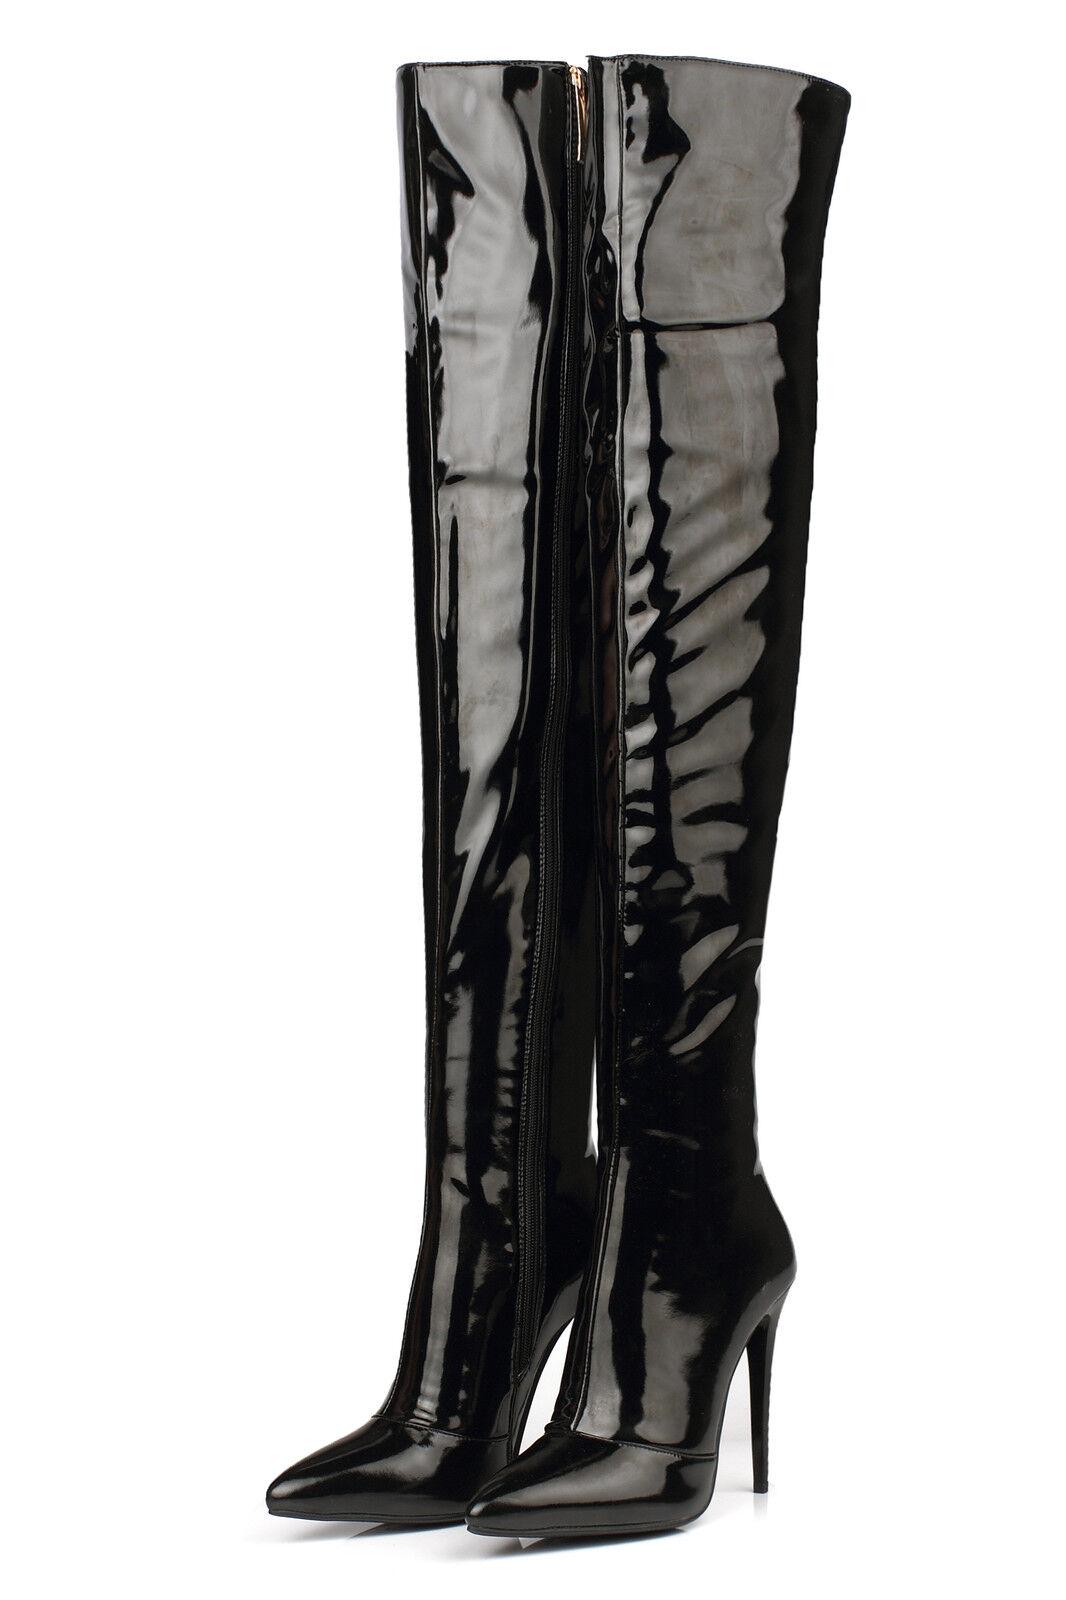 Da Donna in pelle laterali Zipper  A PUNTA a SPILLO Sopra   Zipper Stivali al Ginocchio 11-9 37895d